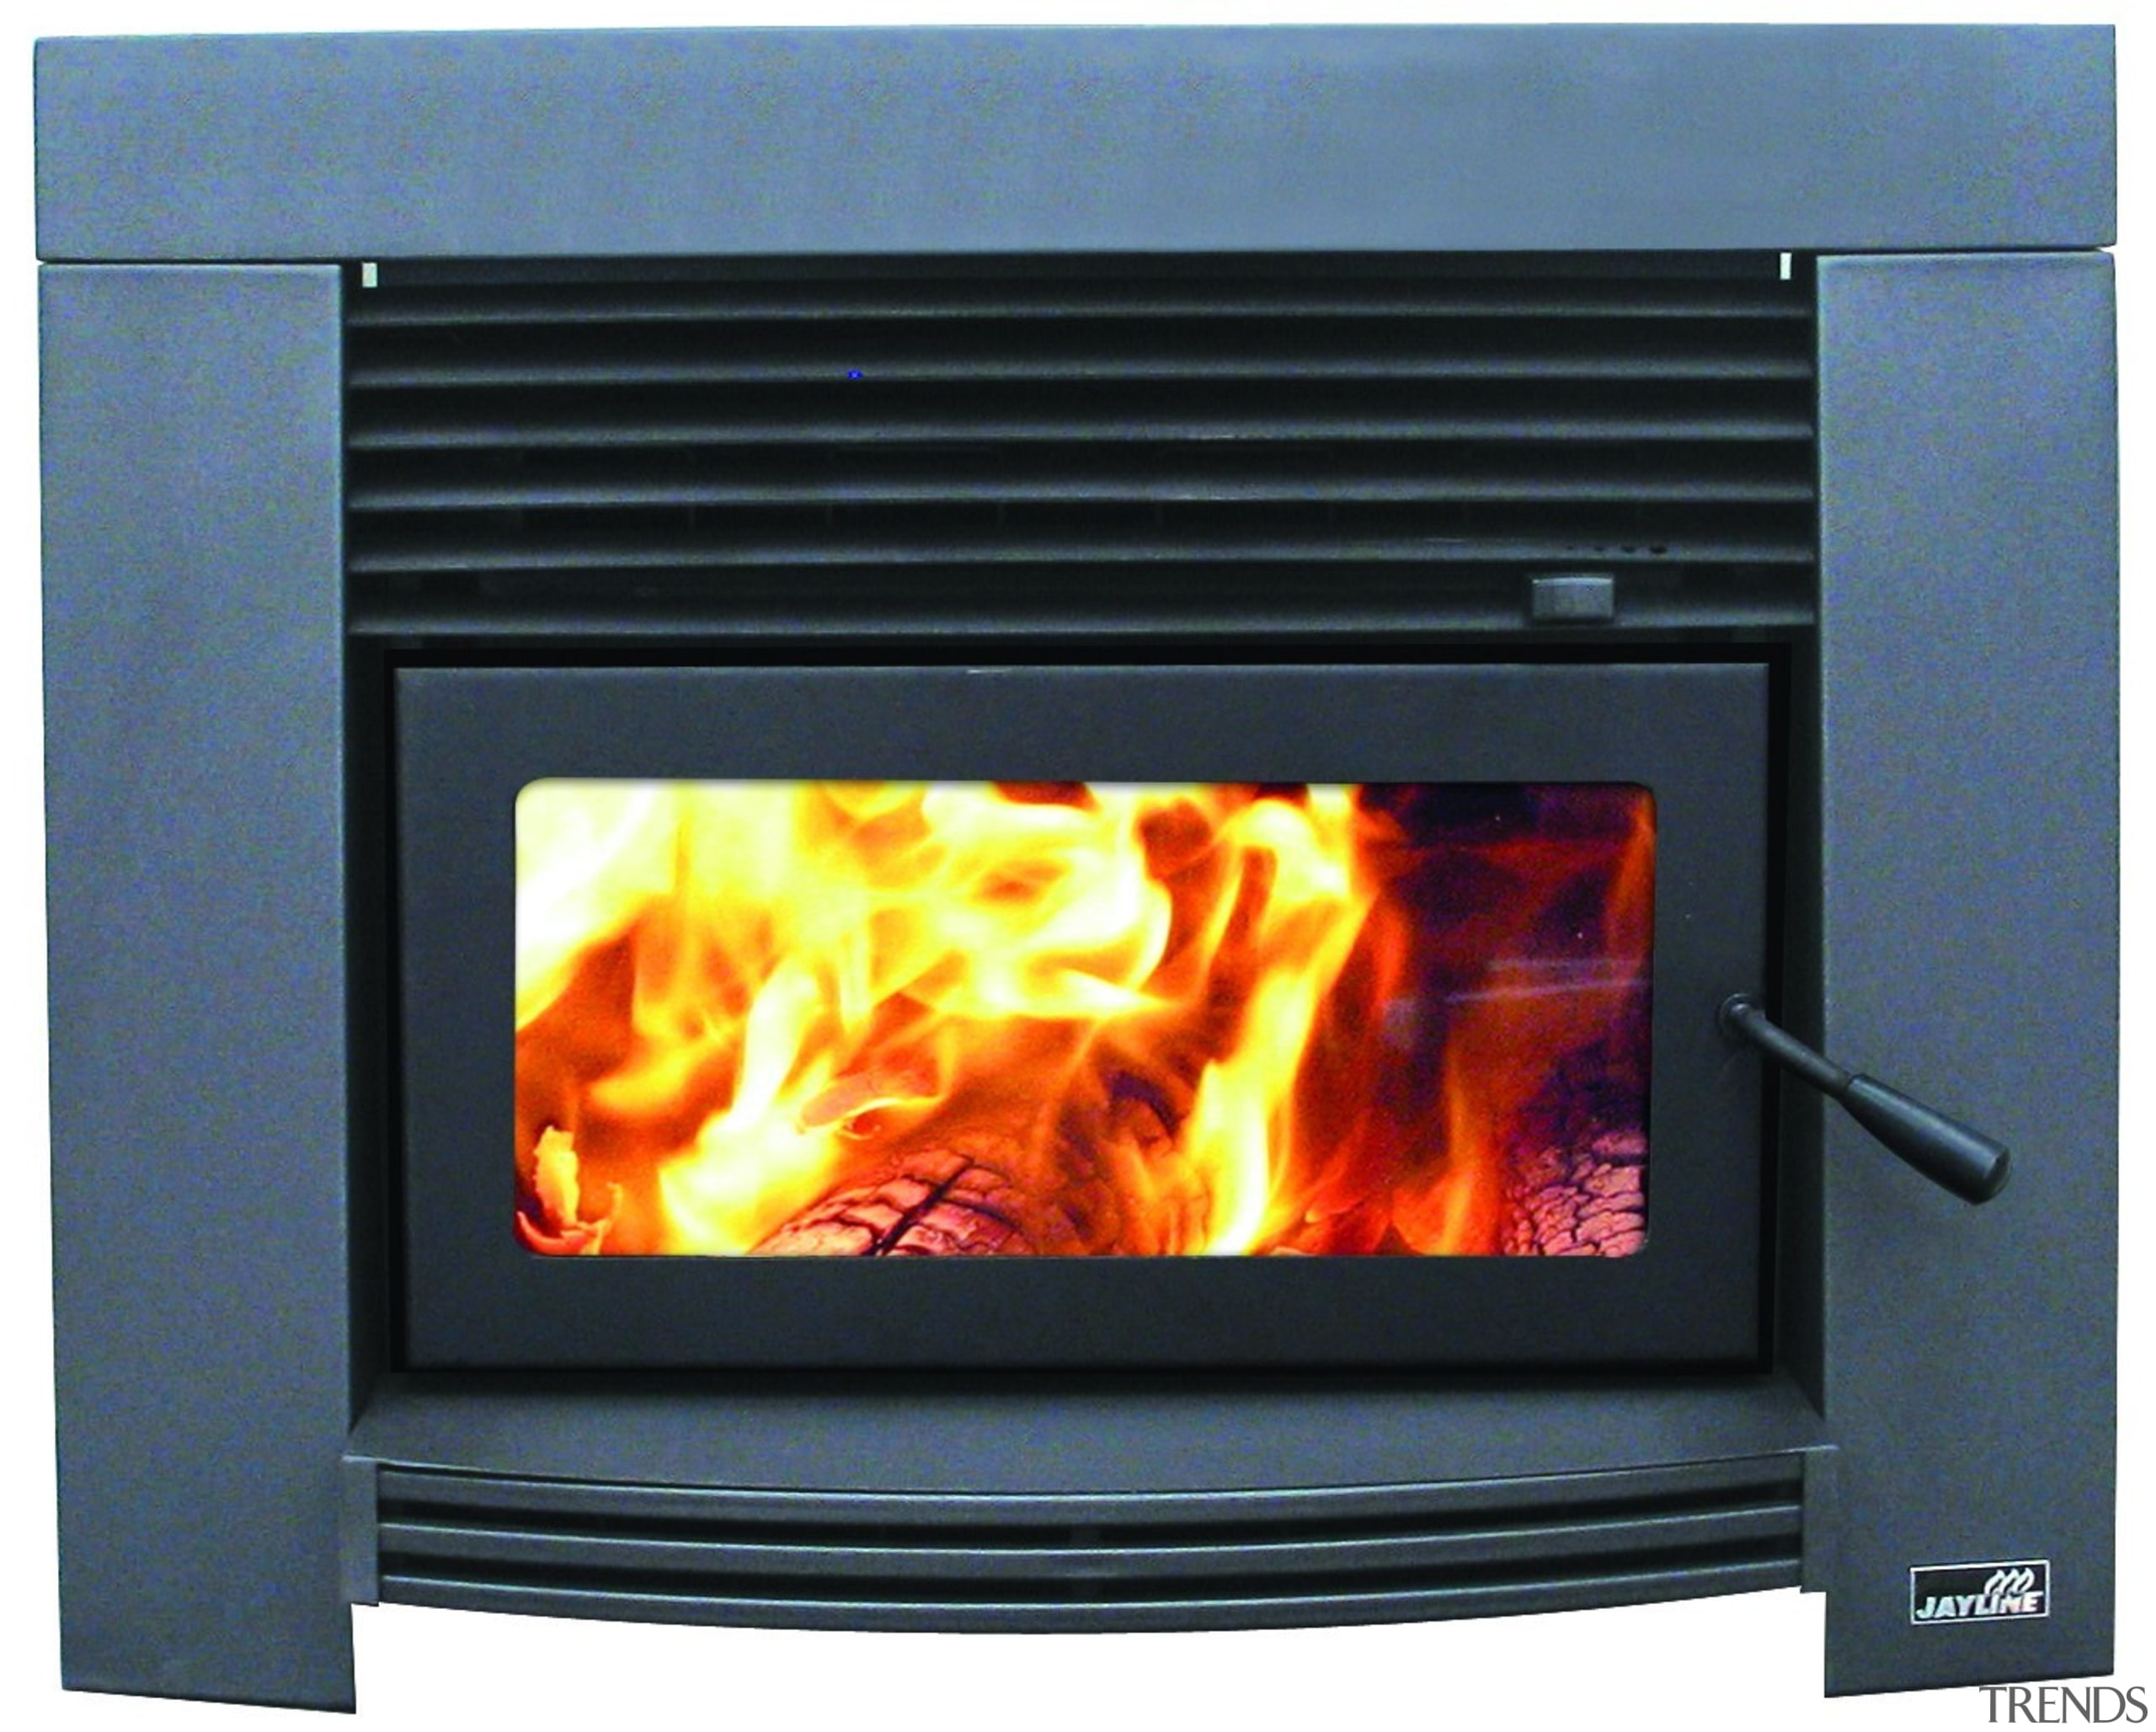 Jayline IS550 Insert 14kW Wood Fire - Jayline hearth, heat, home appliance, wood burning stove, black